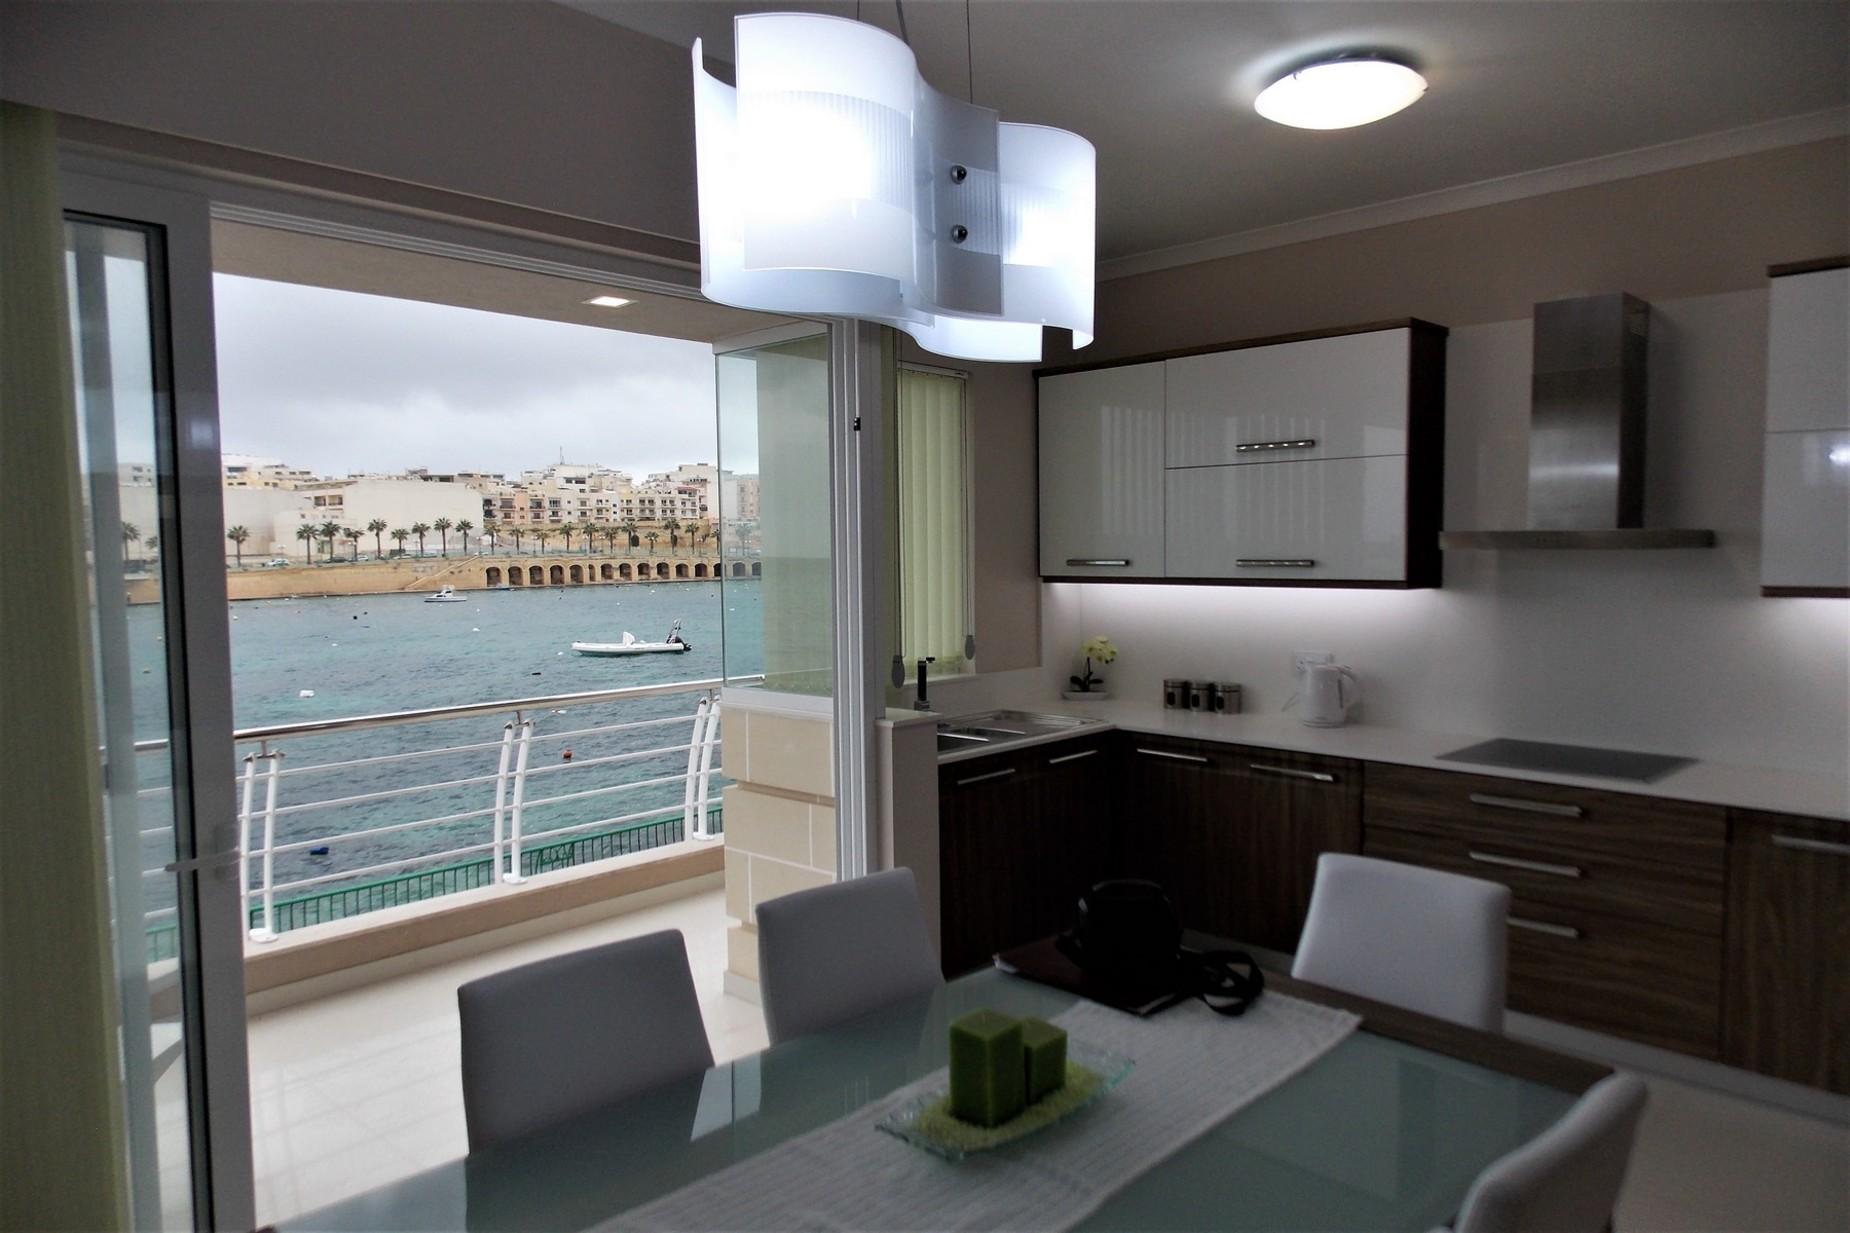 2 bed Terraced House For Rent in Marsascala, Marsascala - thumb 5